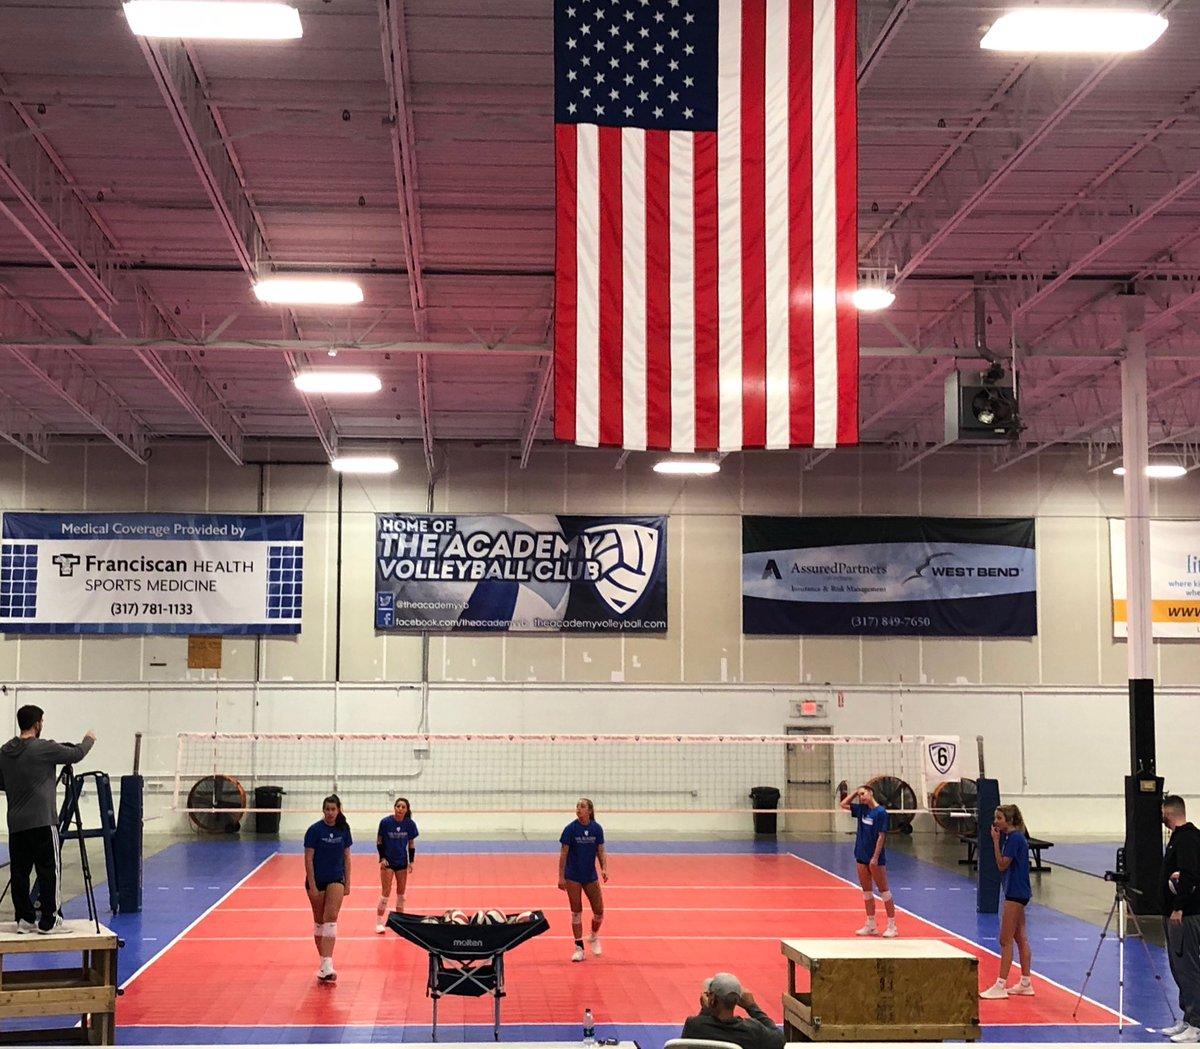 The Academy: The Academy Volleyball Club (@TheAcademyVB)